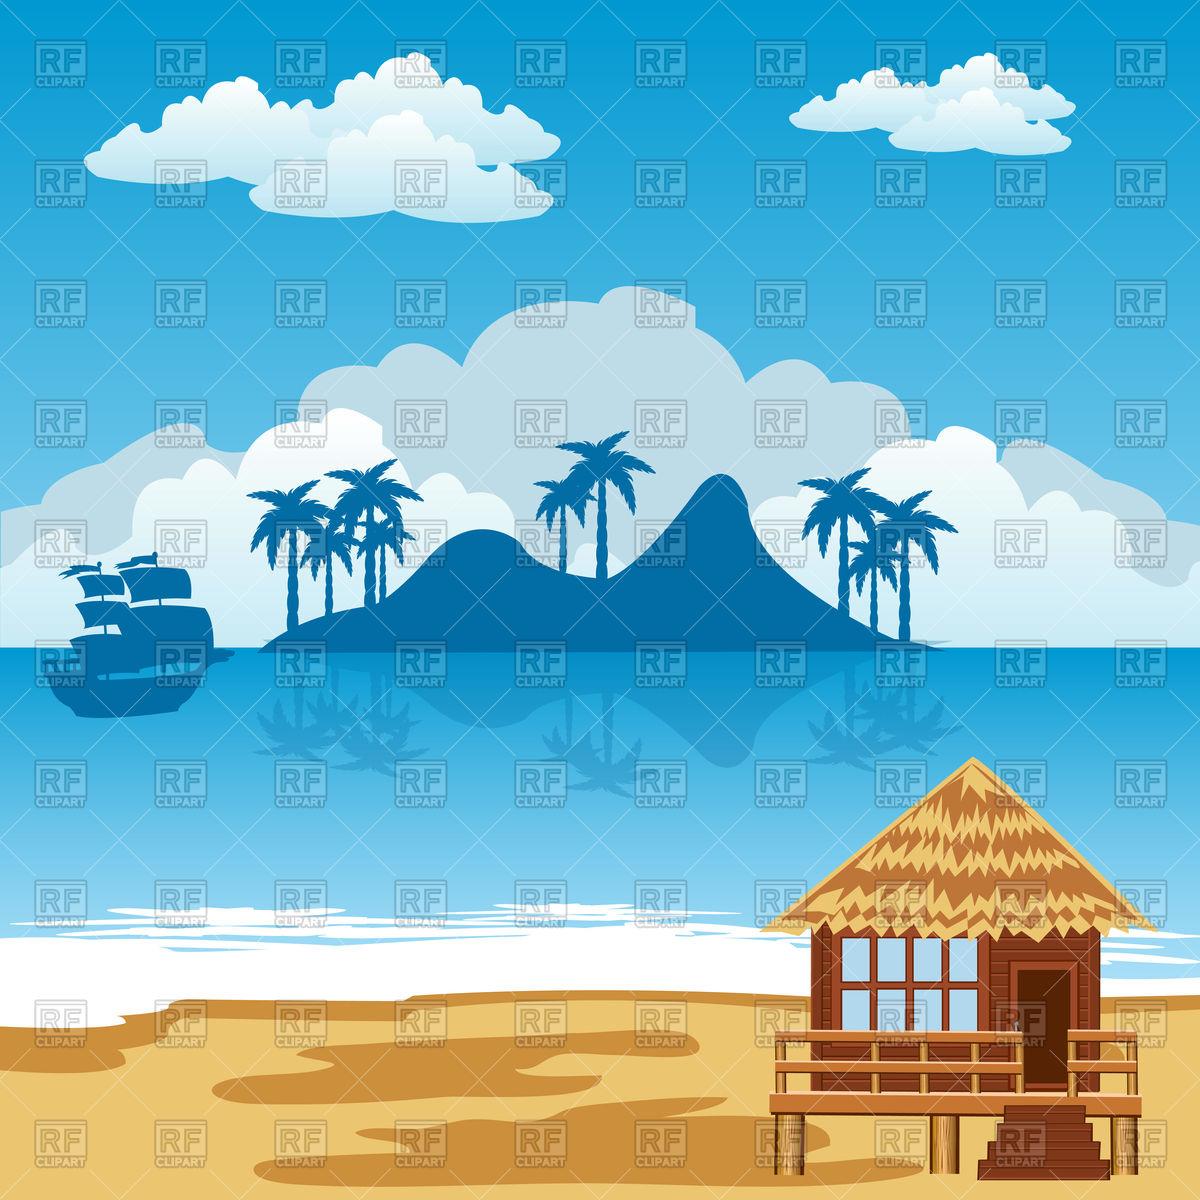 Seamless horizontal pattern with sunny seashore Vector Image.